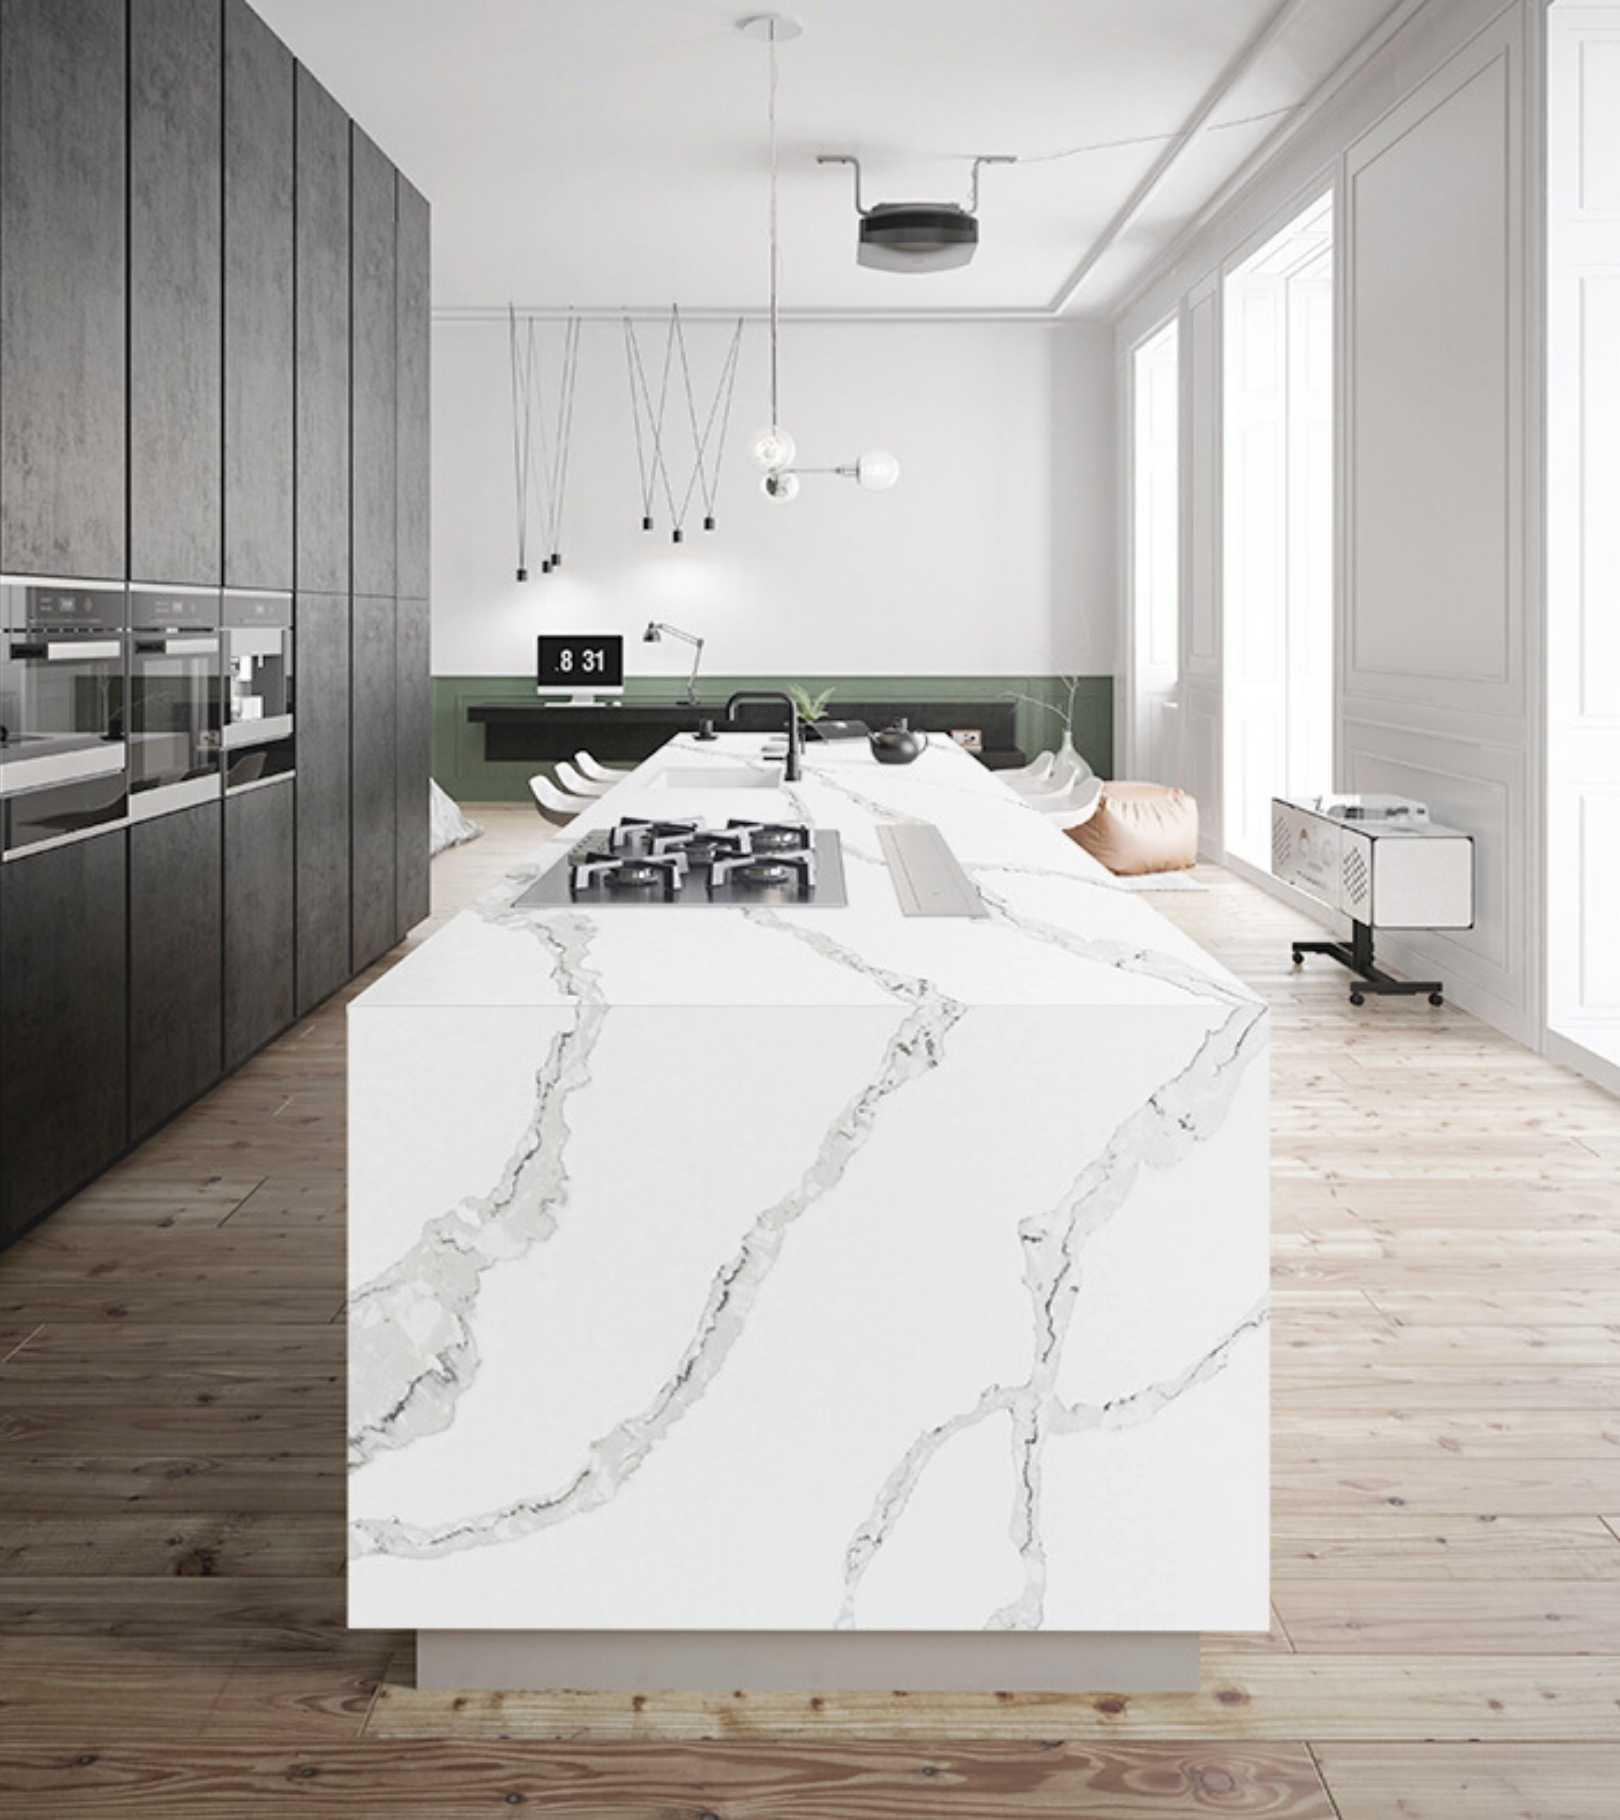 Calacatta Italia quartz kitchen countertop